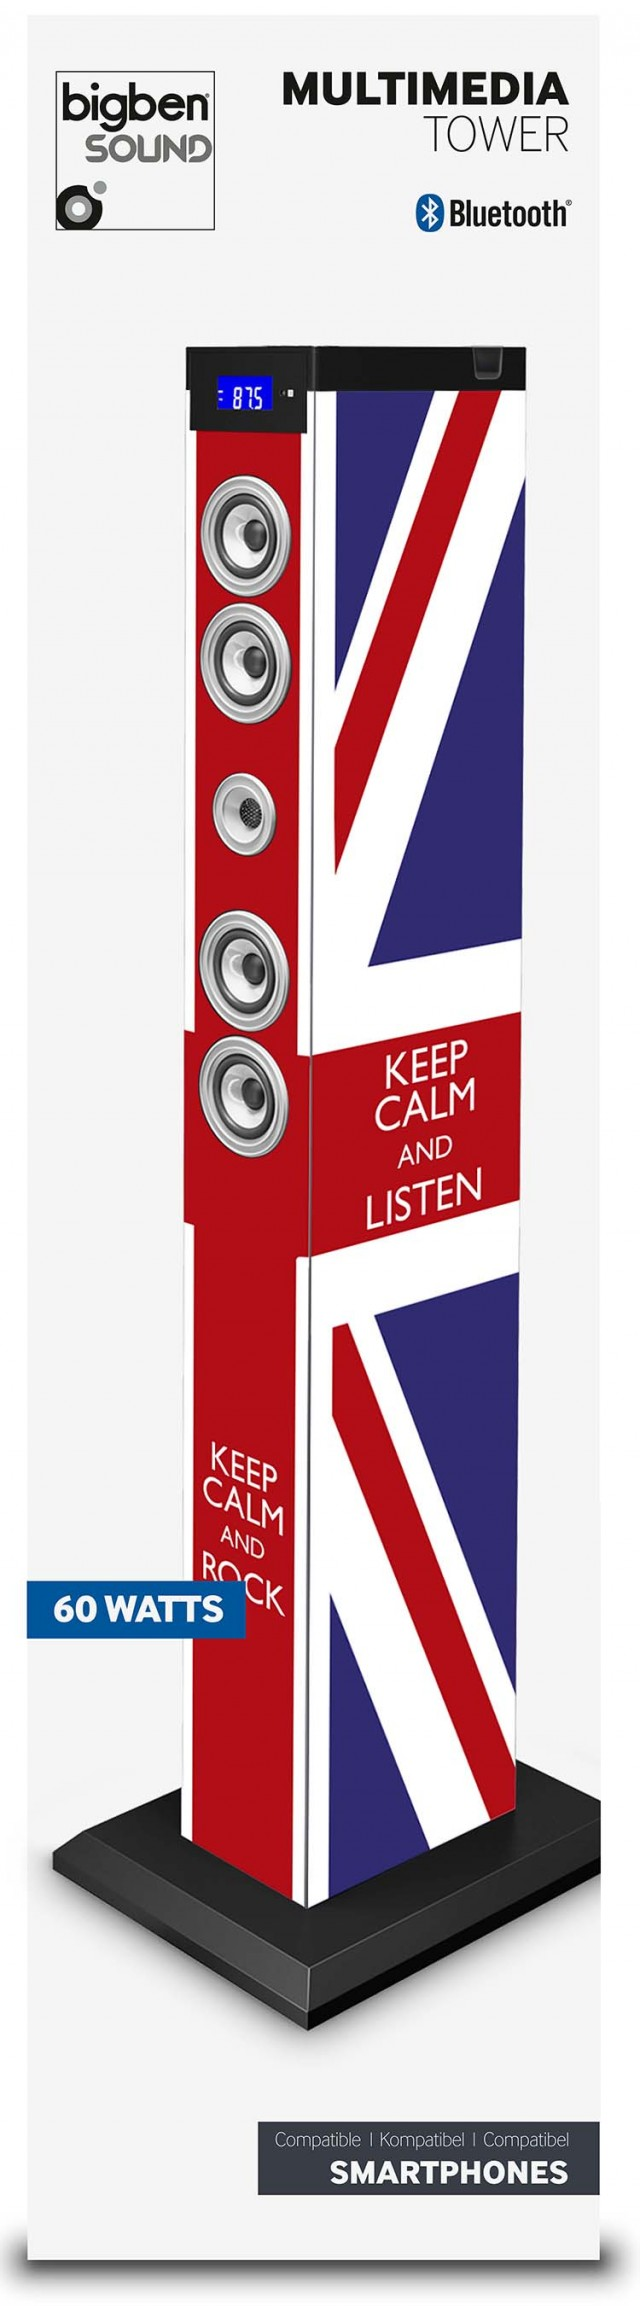 Sound Tower TW9 – Keep calm - Packshot